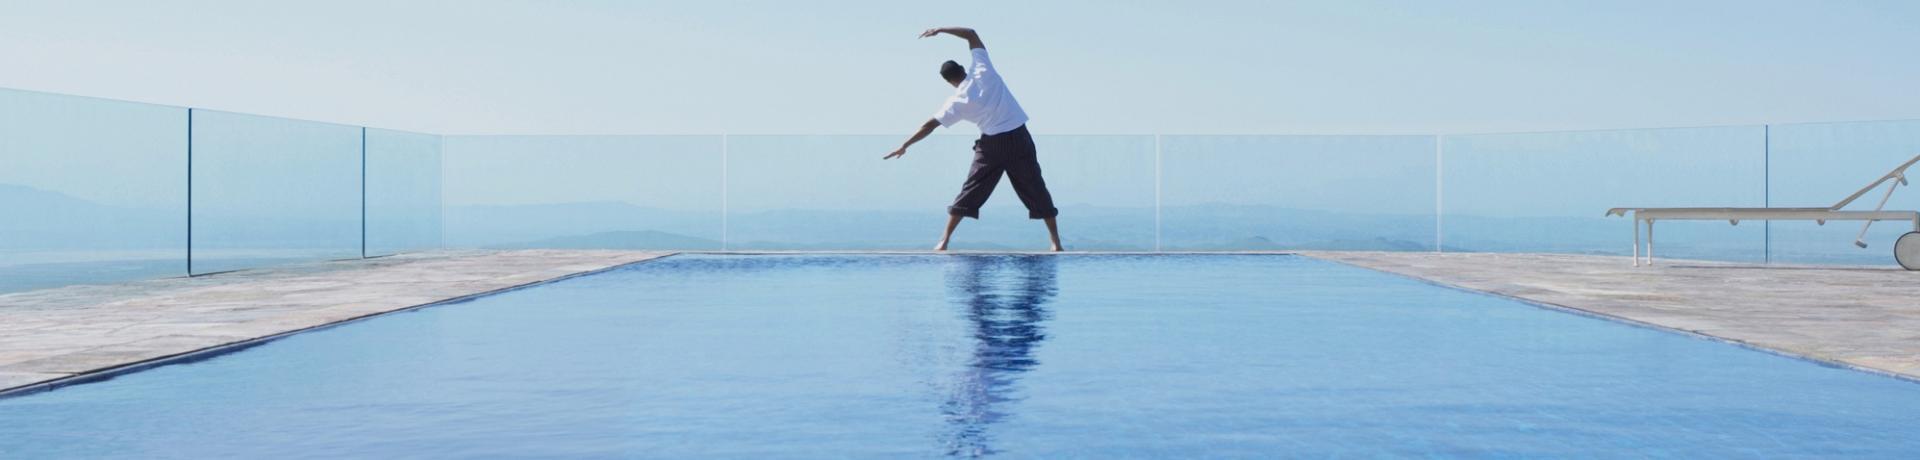 Sonstiges: Hotel Pool Yoga